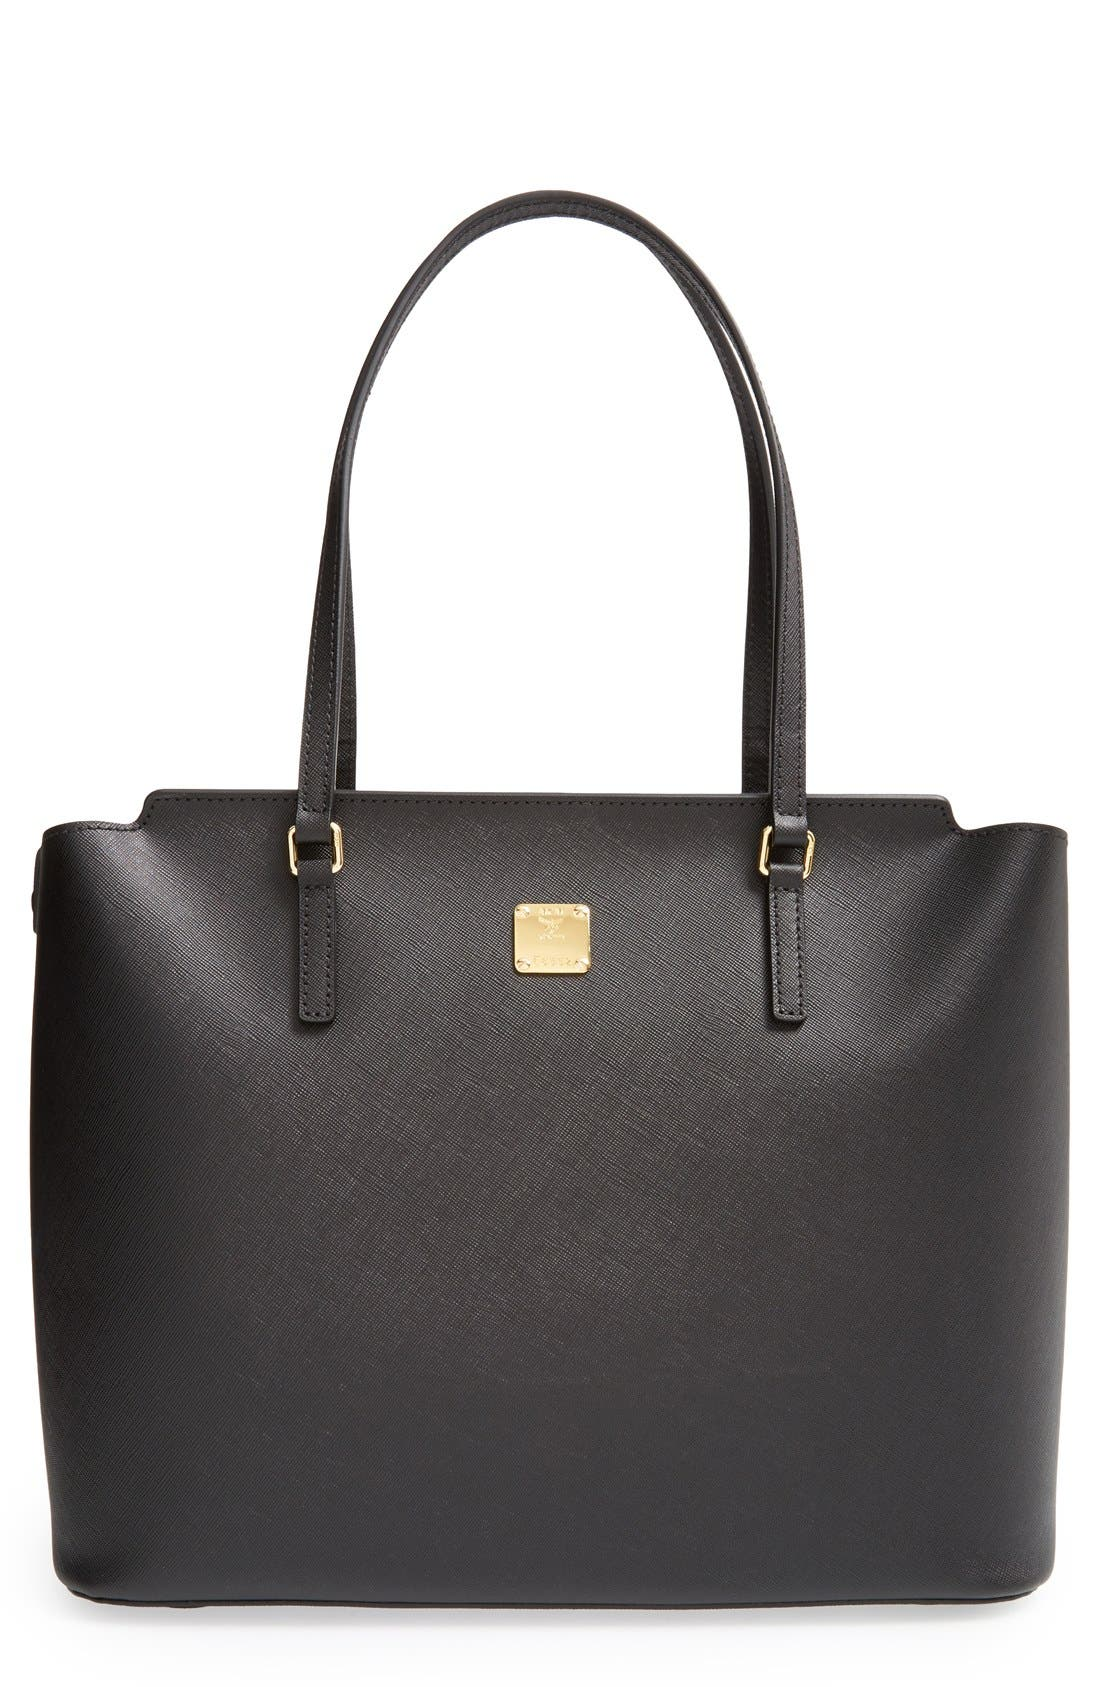 Alternate Image 1 Selected - MCM 'Medium Project' Saffiano Leather Shopper